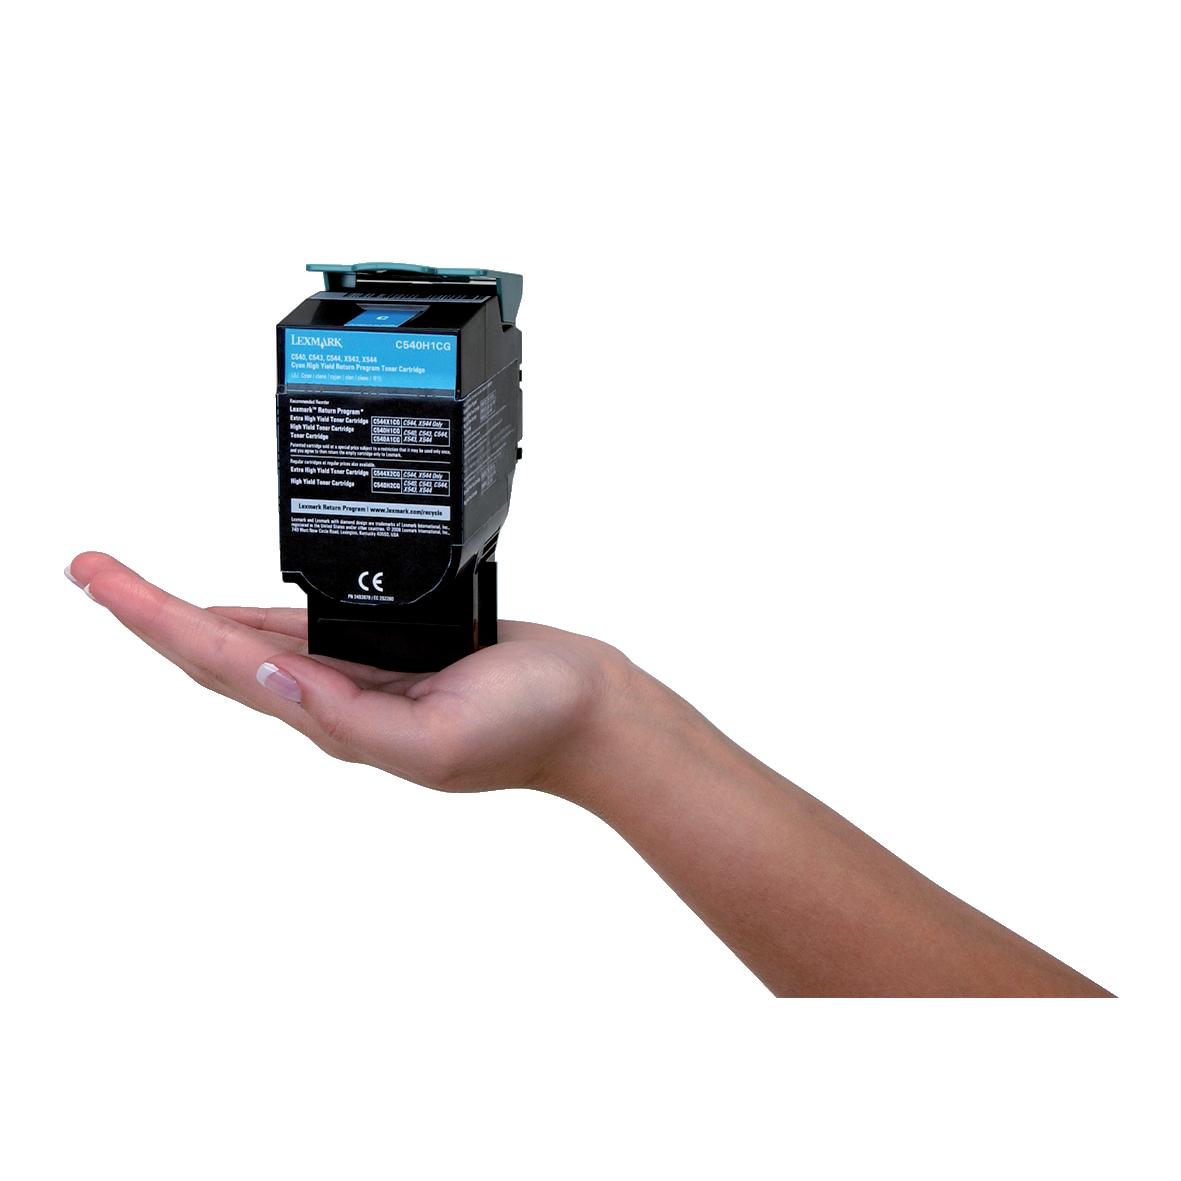 Lexmark C54/X54 Laser Toner Cartridge Return Programme High Yield Page Life 2000pp Cyan Ref C540H1CG